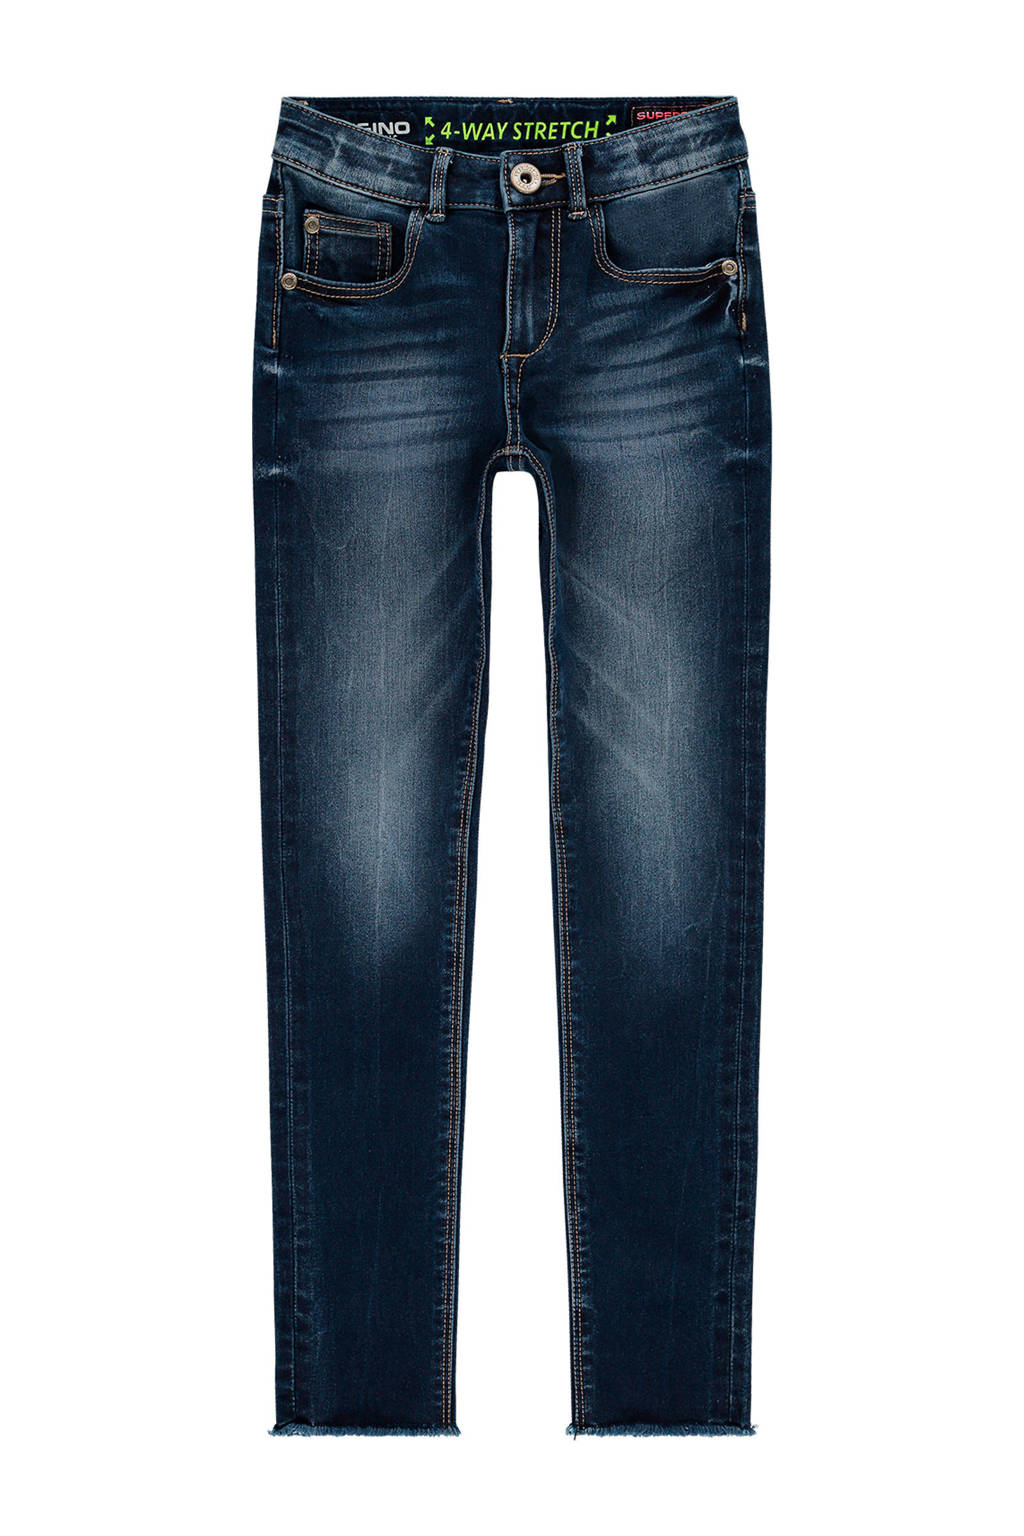 Vingino super skinny jeans Beverly mid blue wash, Mid Blue Wash